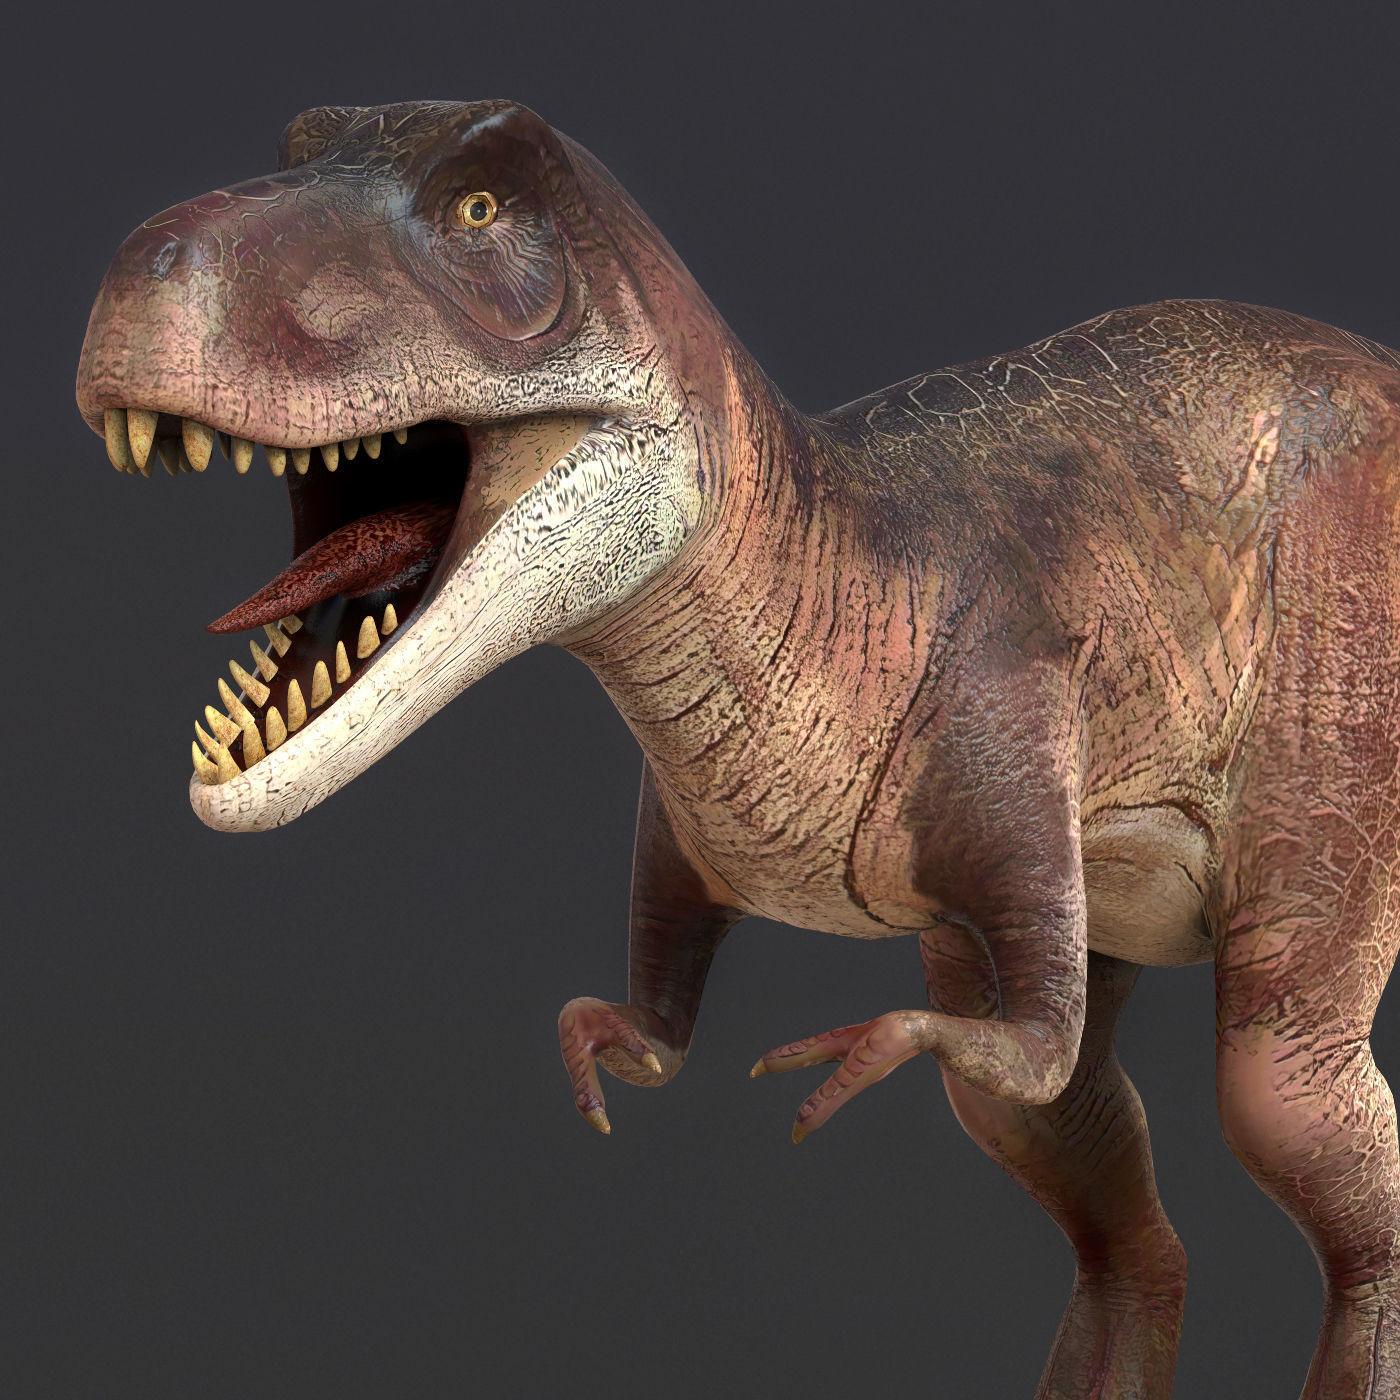 Young Trex Dinosaur